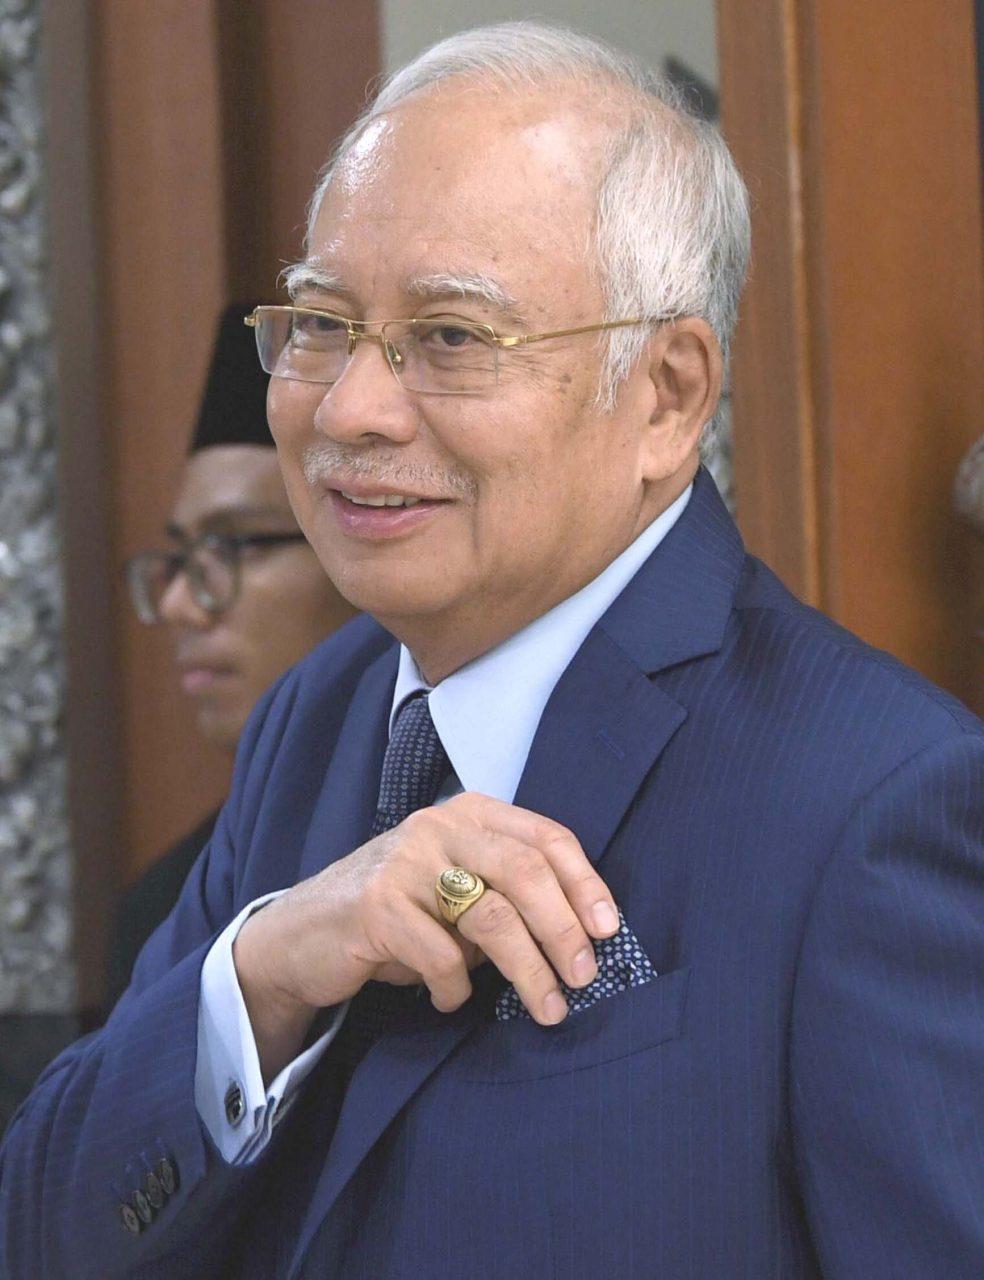 1MDB audit report tampering trial kicks off